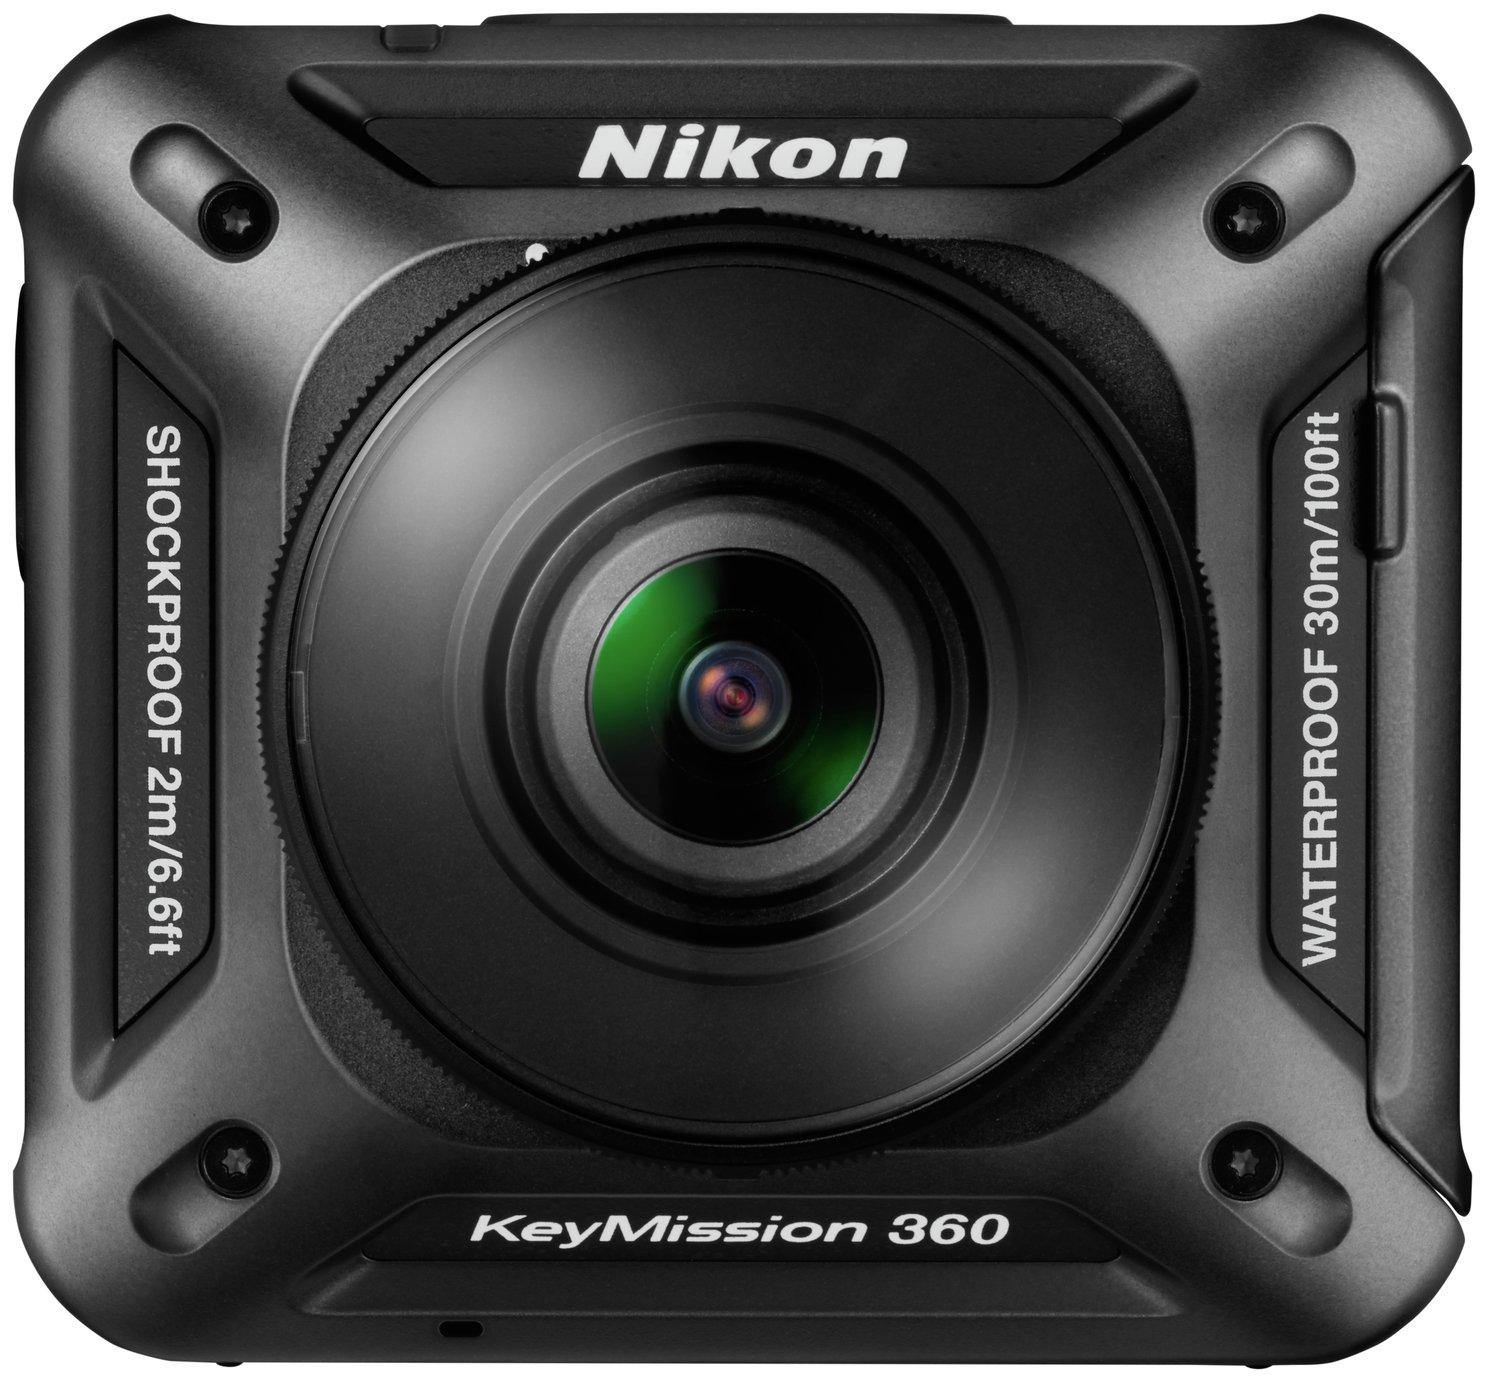 Nikon Keymission 4K 360 Action Camera review